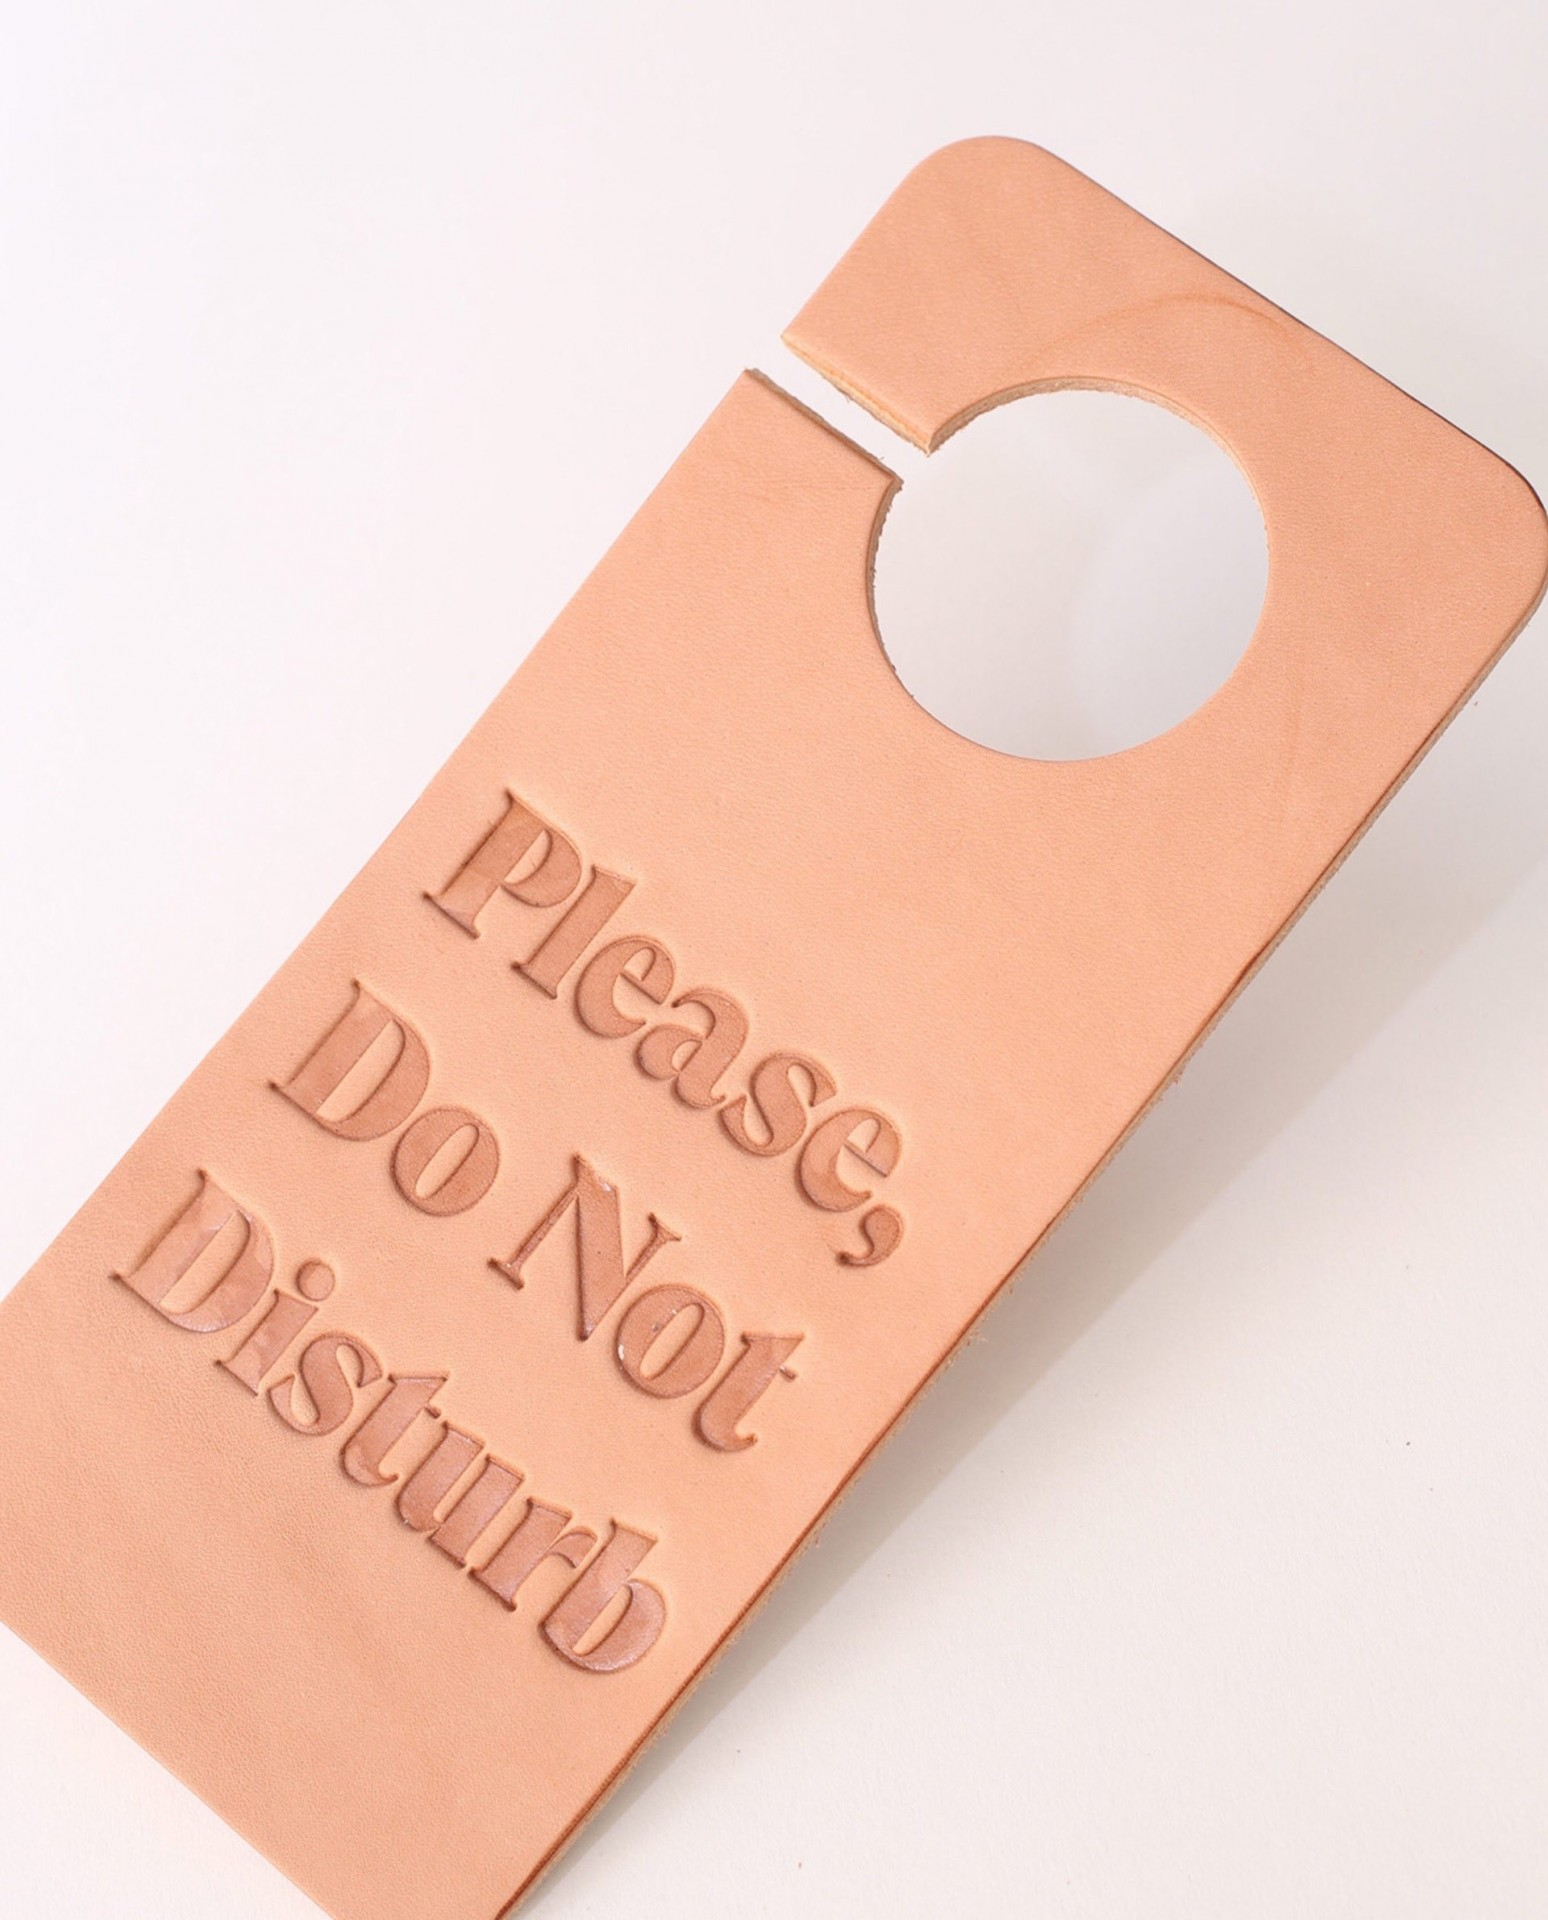 foxtrot-supply-co-do-not-disturb-leather-door-hangs-natural